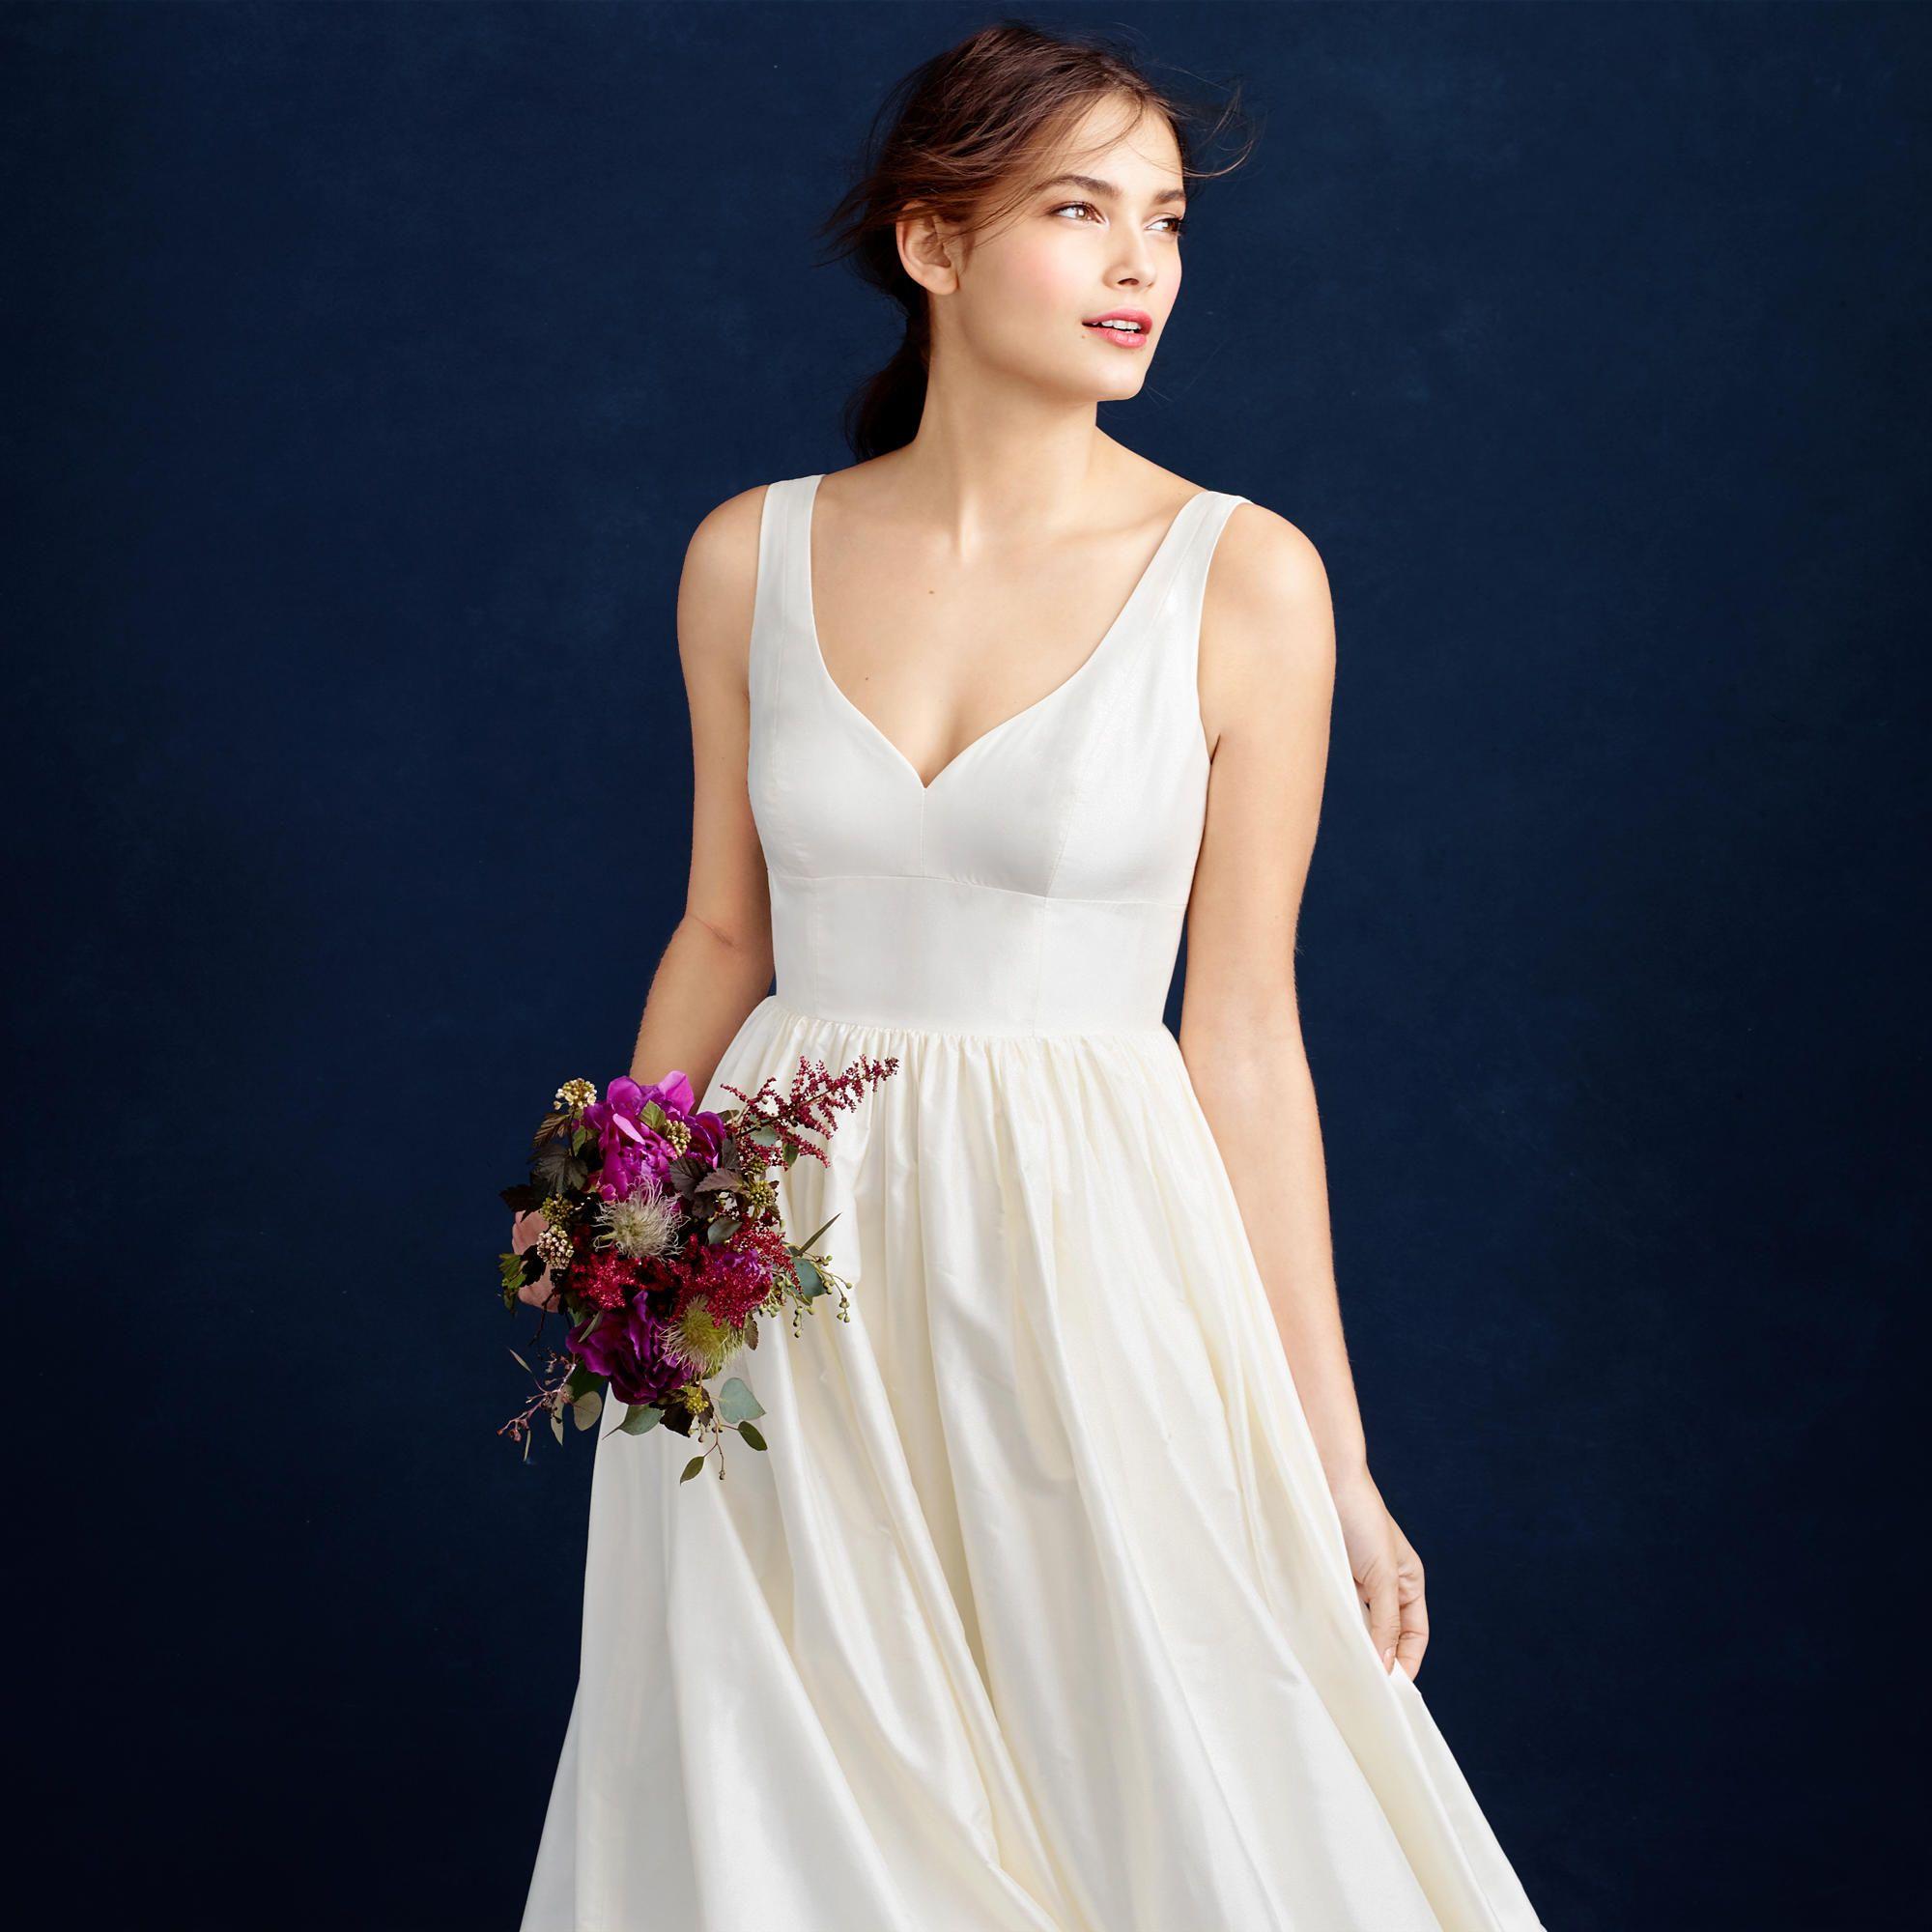 Jcrew karlie gown wedding pinterest gowns wedding and